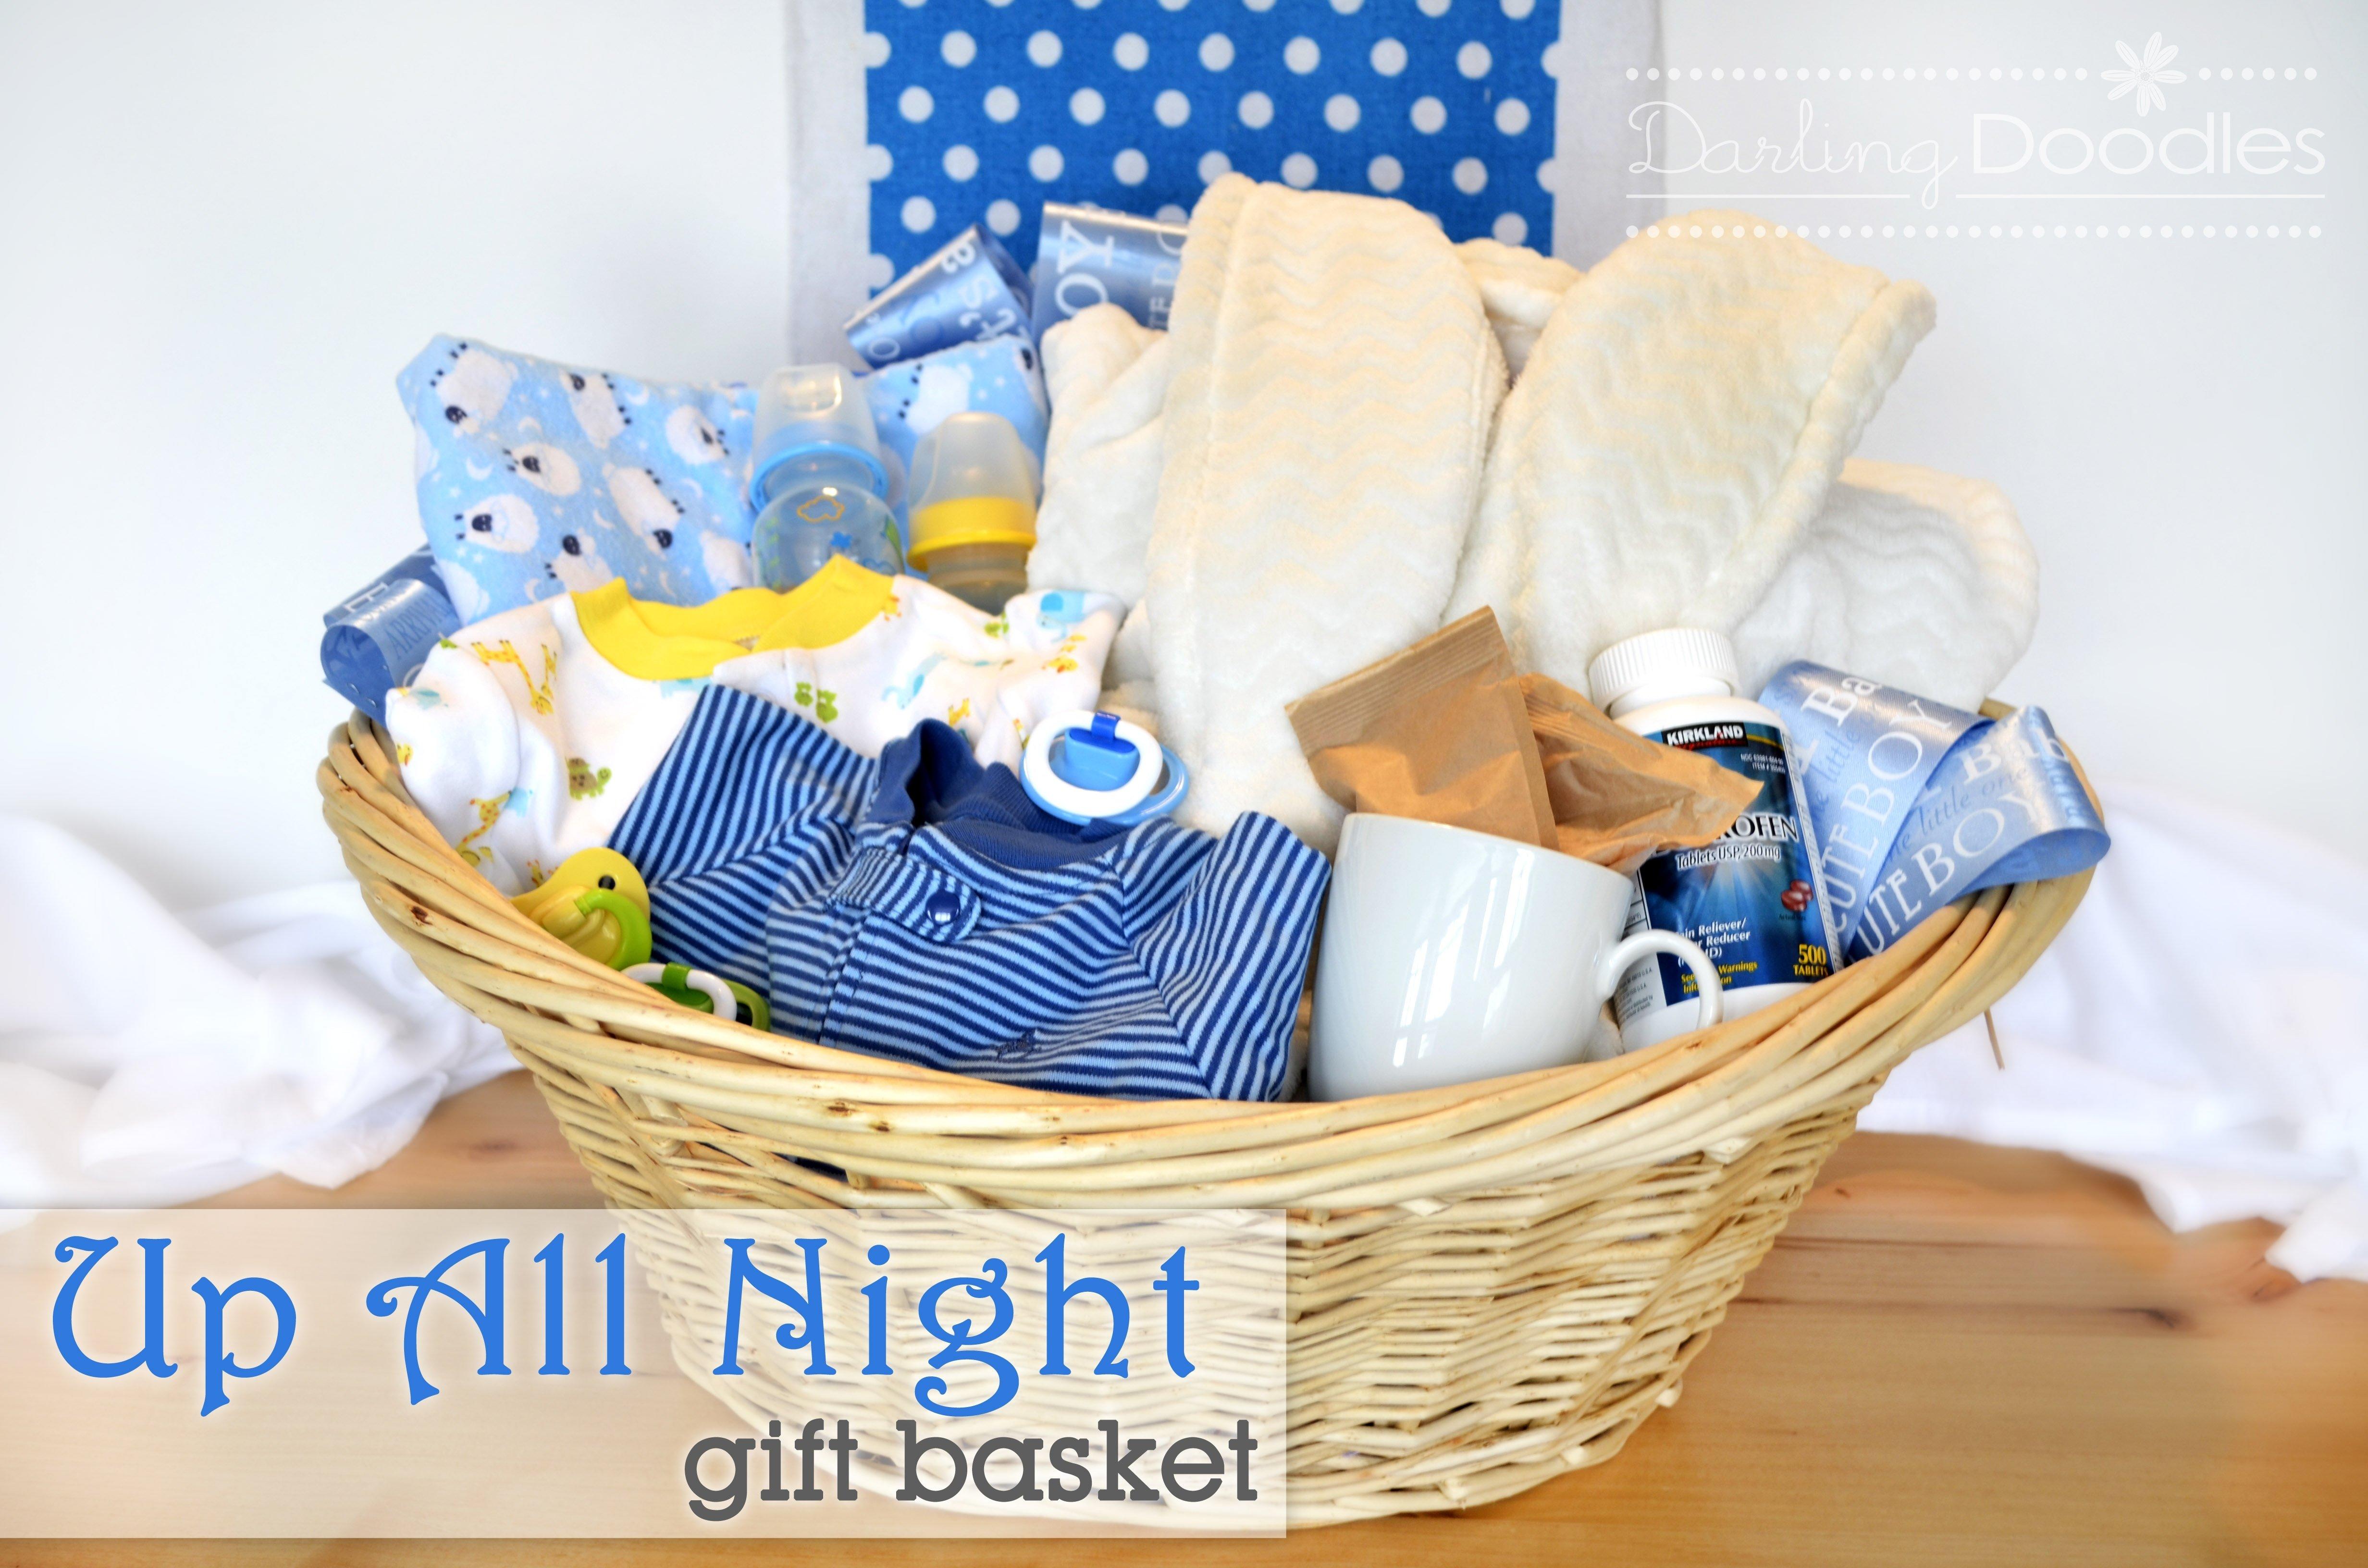 10 Most Popular Baby Boy Gift Basket Ideas baby shower gift baskets for boy e280a2 baby showers ideas 1 2020